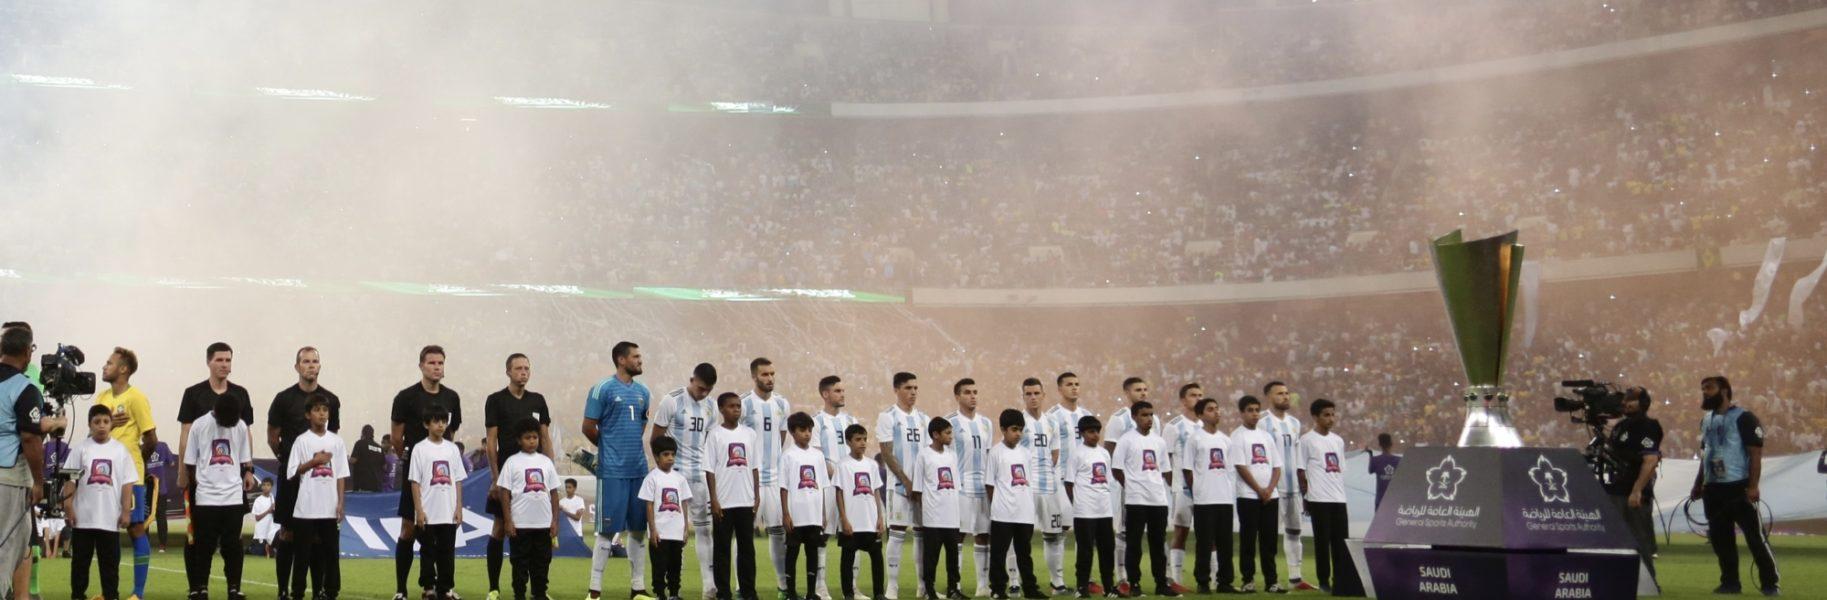 Atmosphere brazil argentina lined up